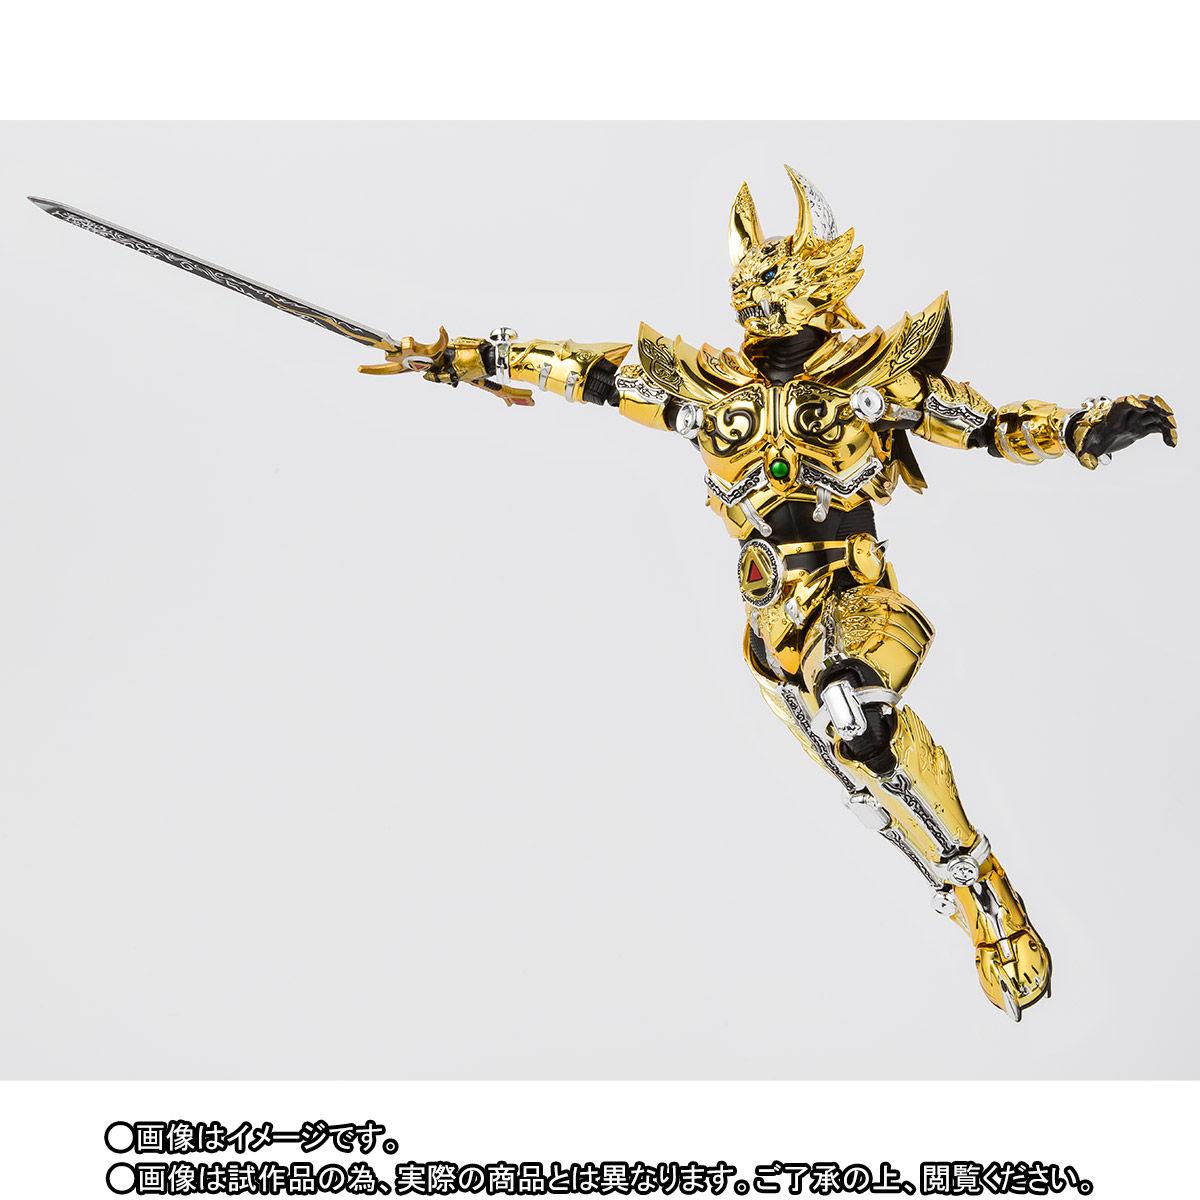 S.H.フィギュアーツ(真骨彫製法)『黄金騎士ガロ(冴島雷牙)』牙狼〈GARO〉可動フィギュア-007